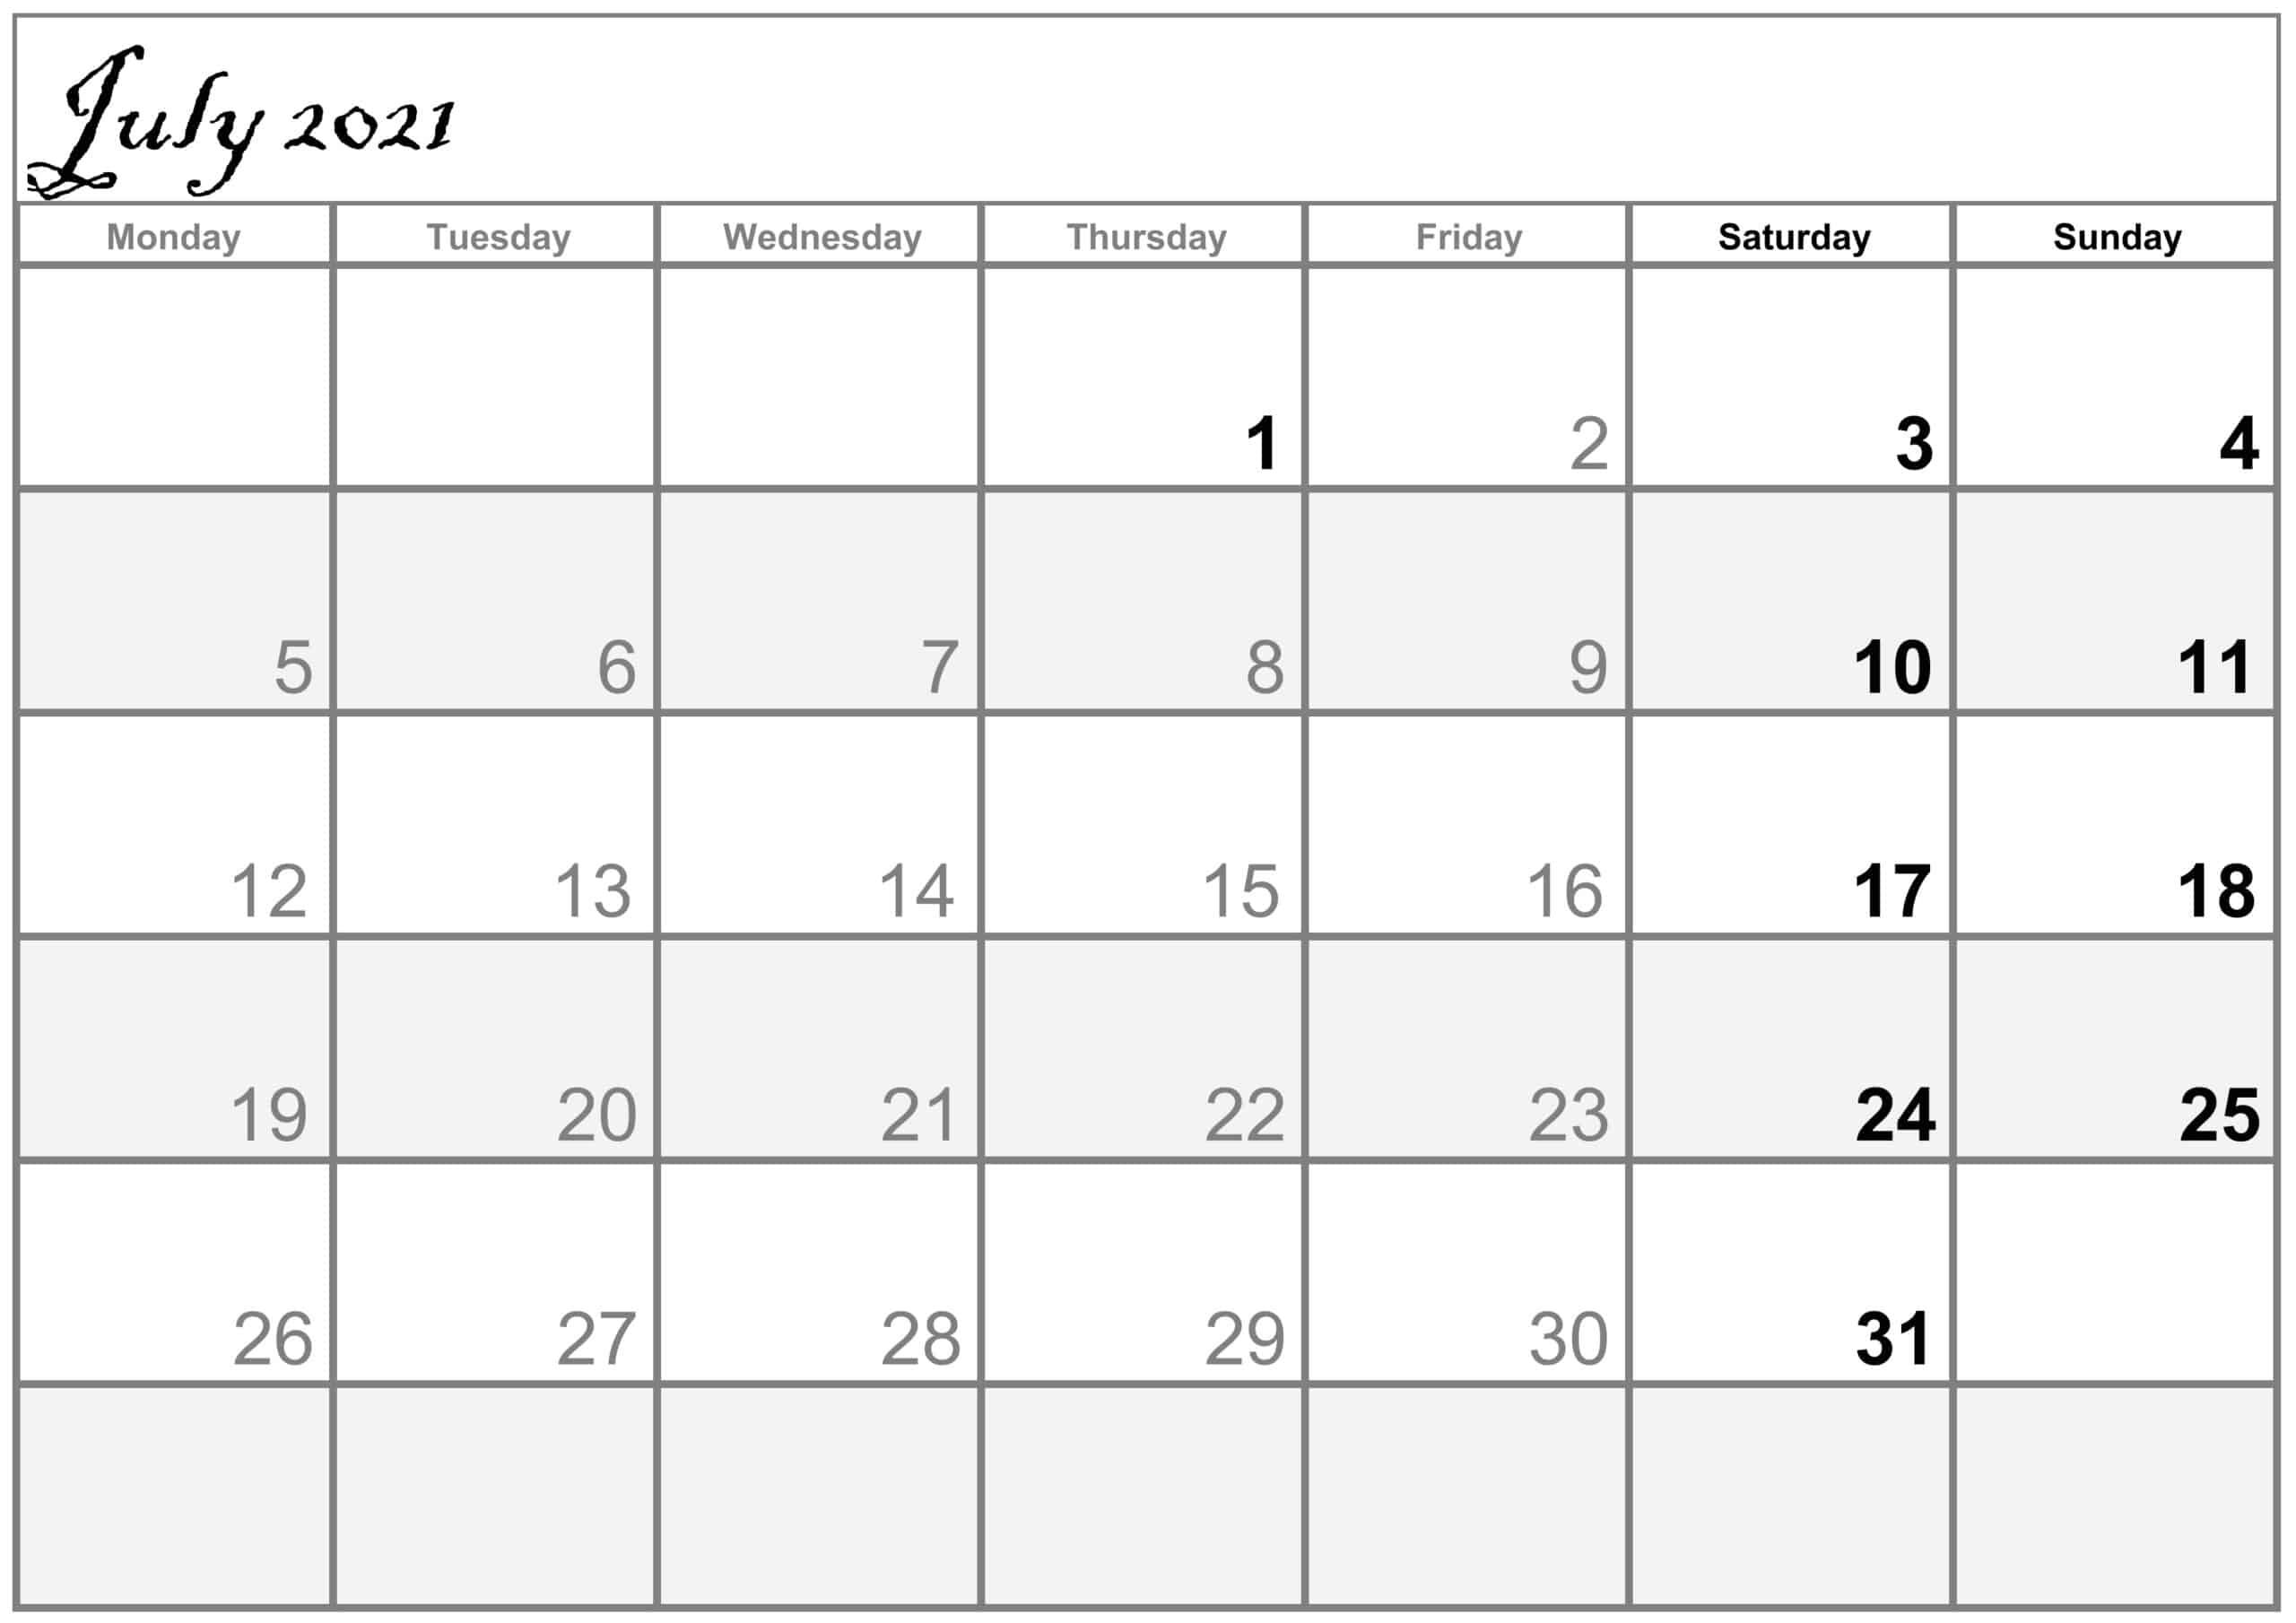 Excel July 2021 Calendar free